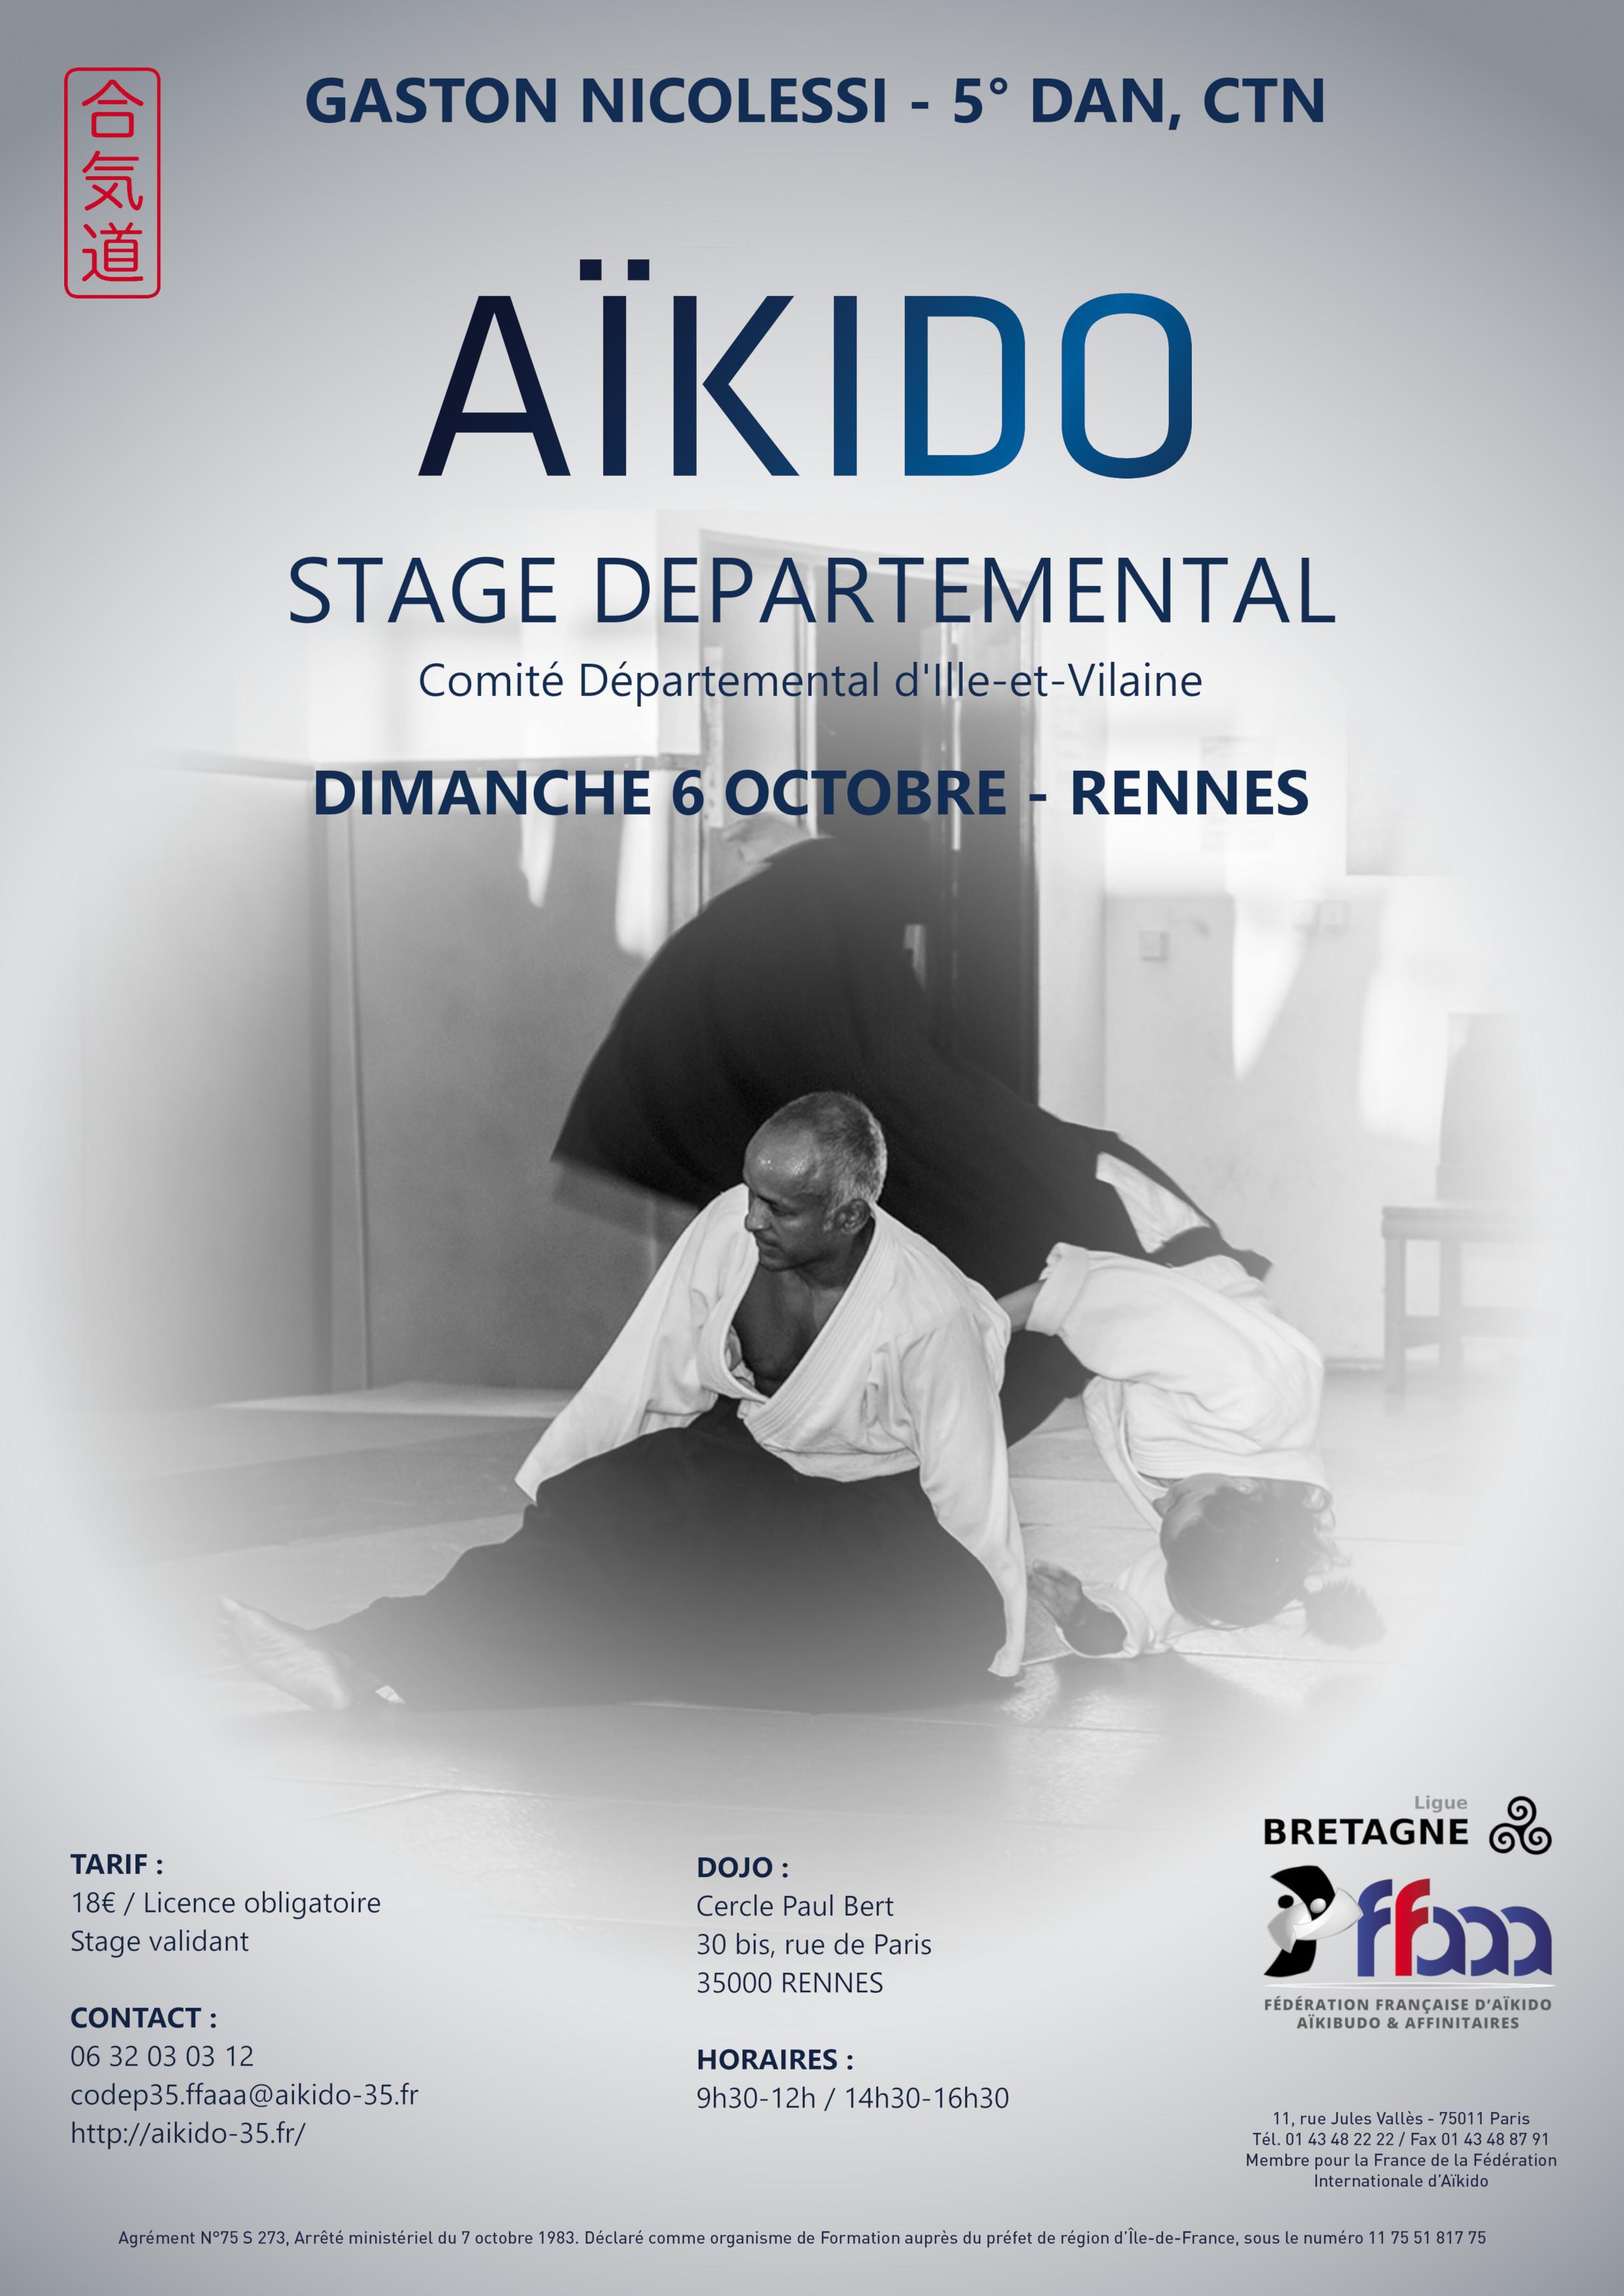 https://www.aikido-bretagne.com/wp-content/uploads/2019/07/Affiche-Stage-Codep35-Rennes-Gaston-Nicolessi-6-Octobre-2019-a4